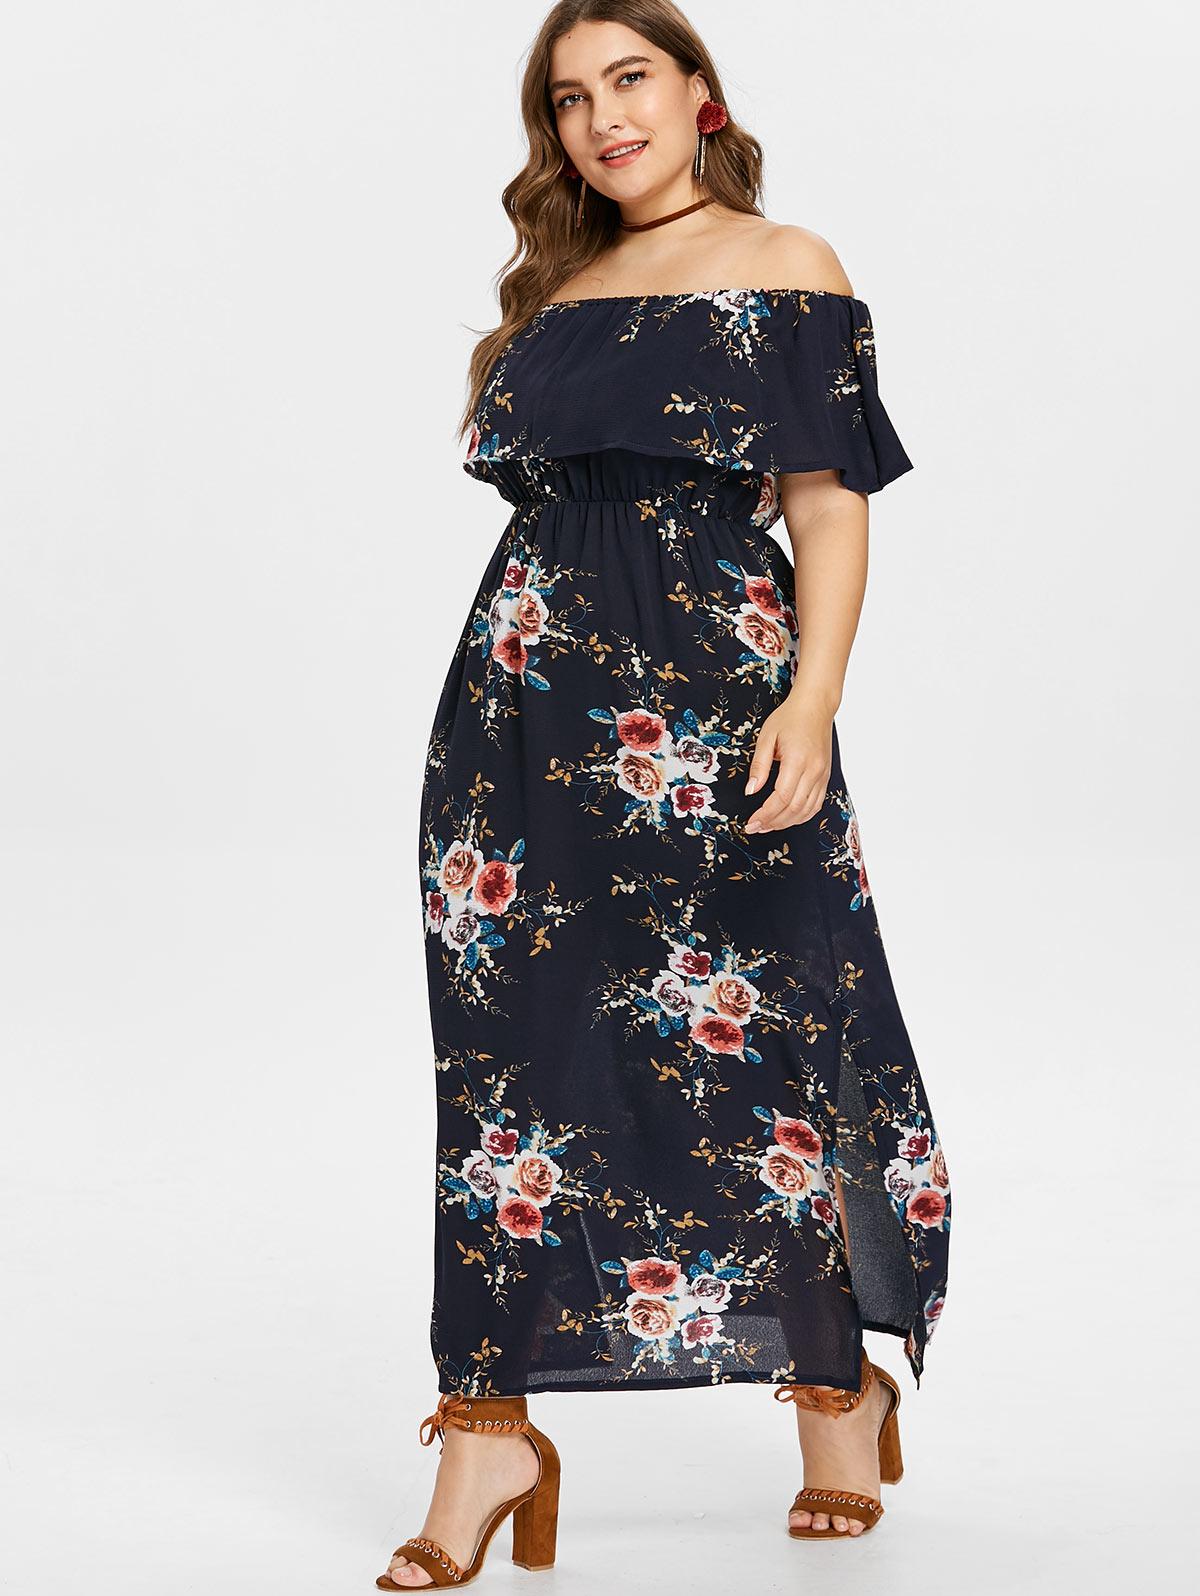 Detail Feedback Questions about Wipalo Plus Size 5XL Off Shoulder Slit  Flower Print Dress Women Summer Beach Dress Short Sleeves A Line Bohemian  Dress ... 2ed6f2b088e5